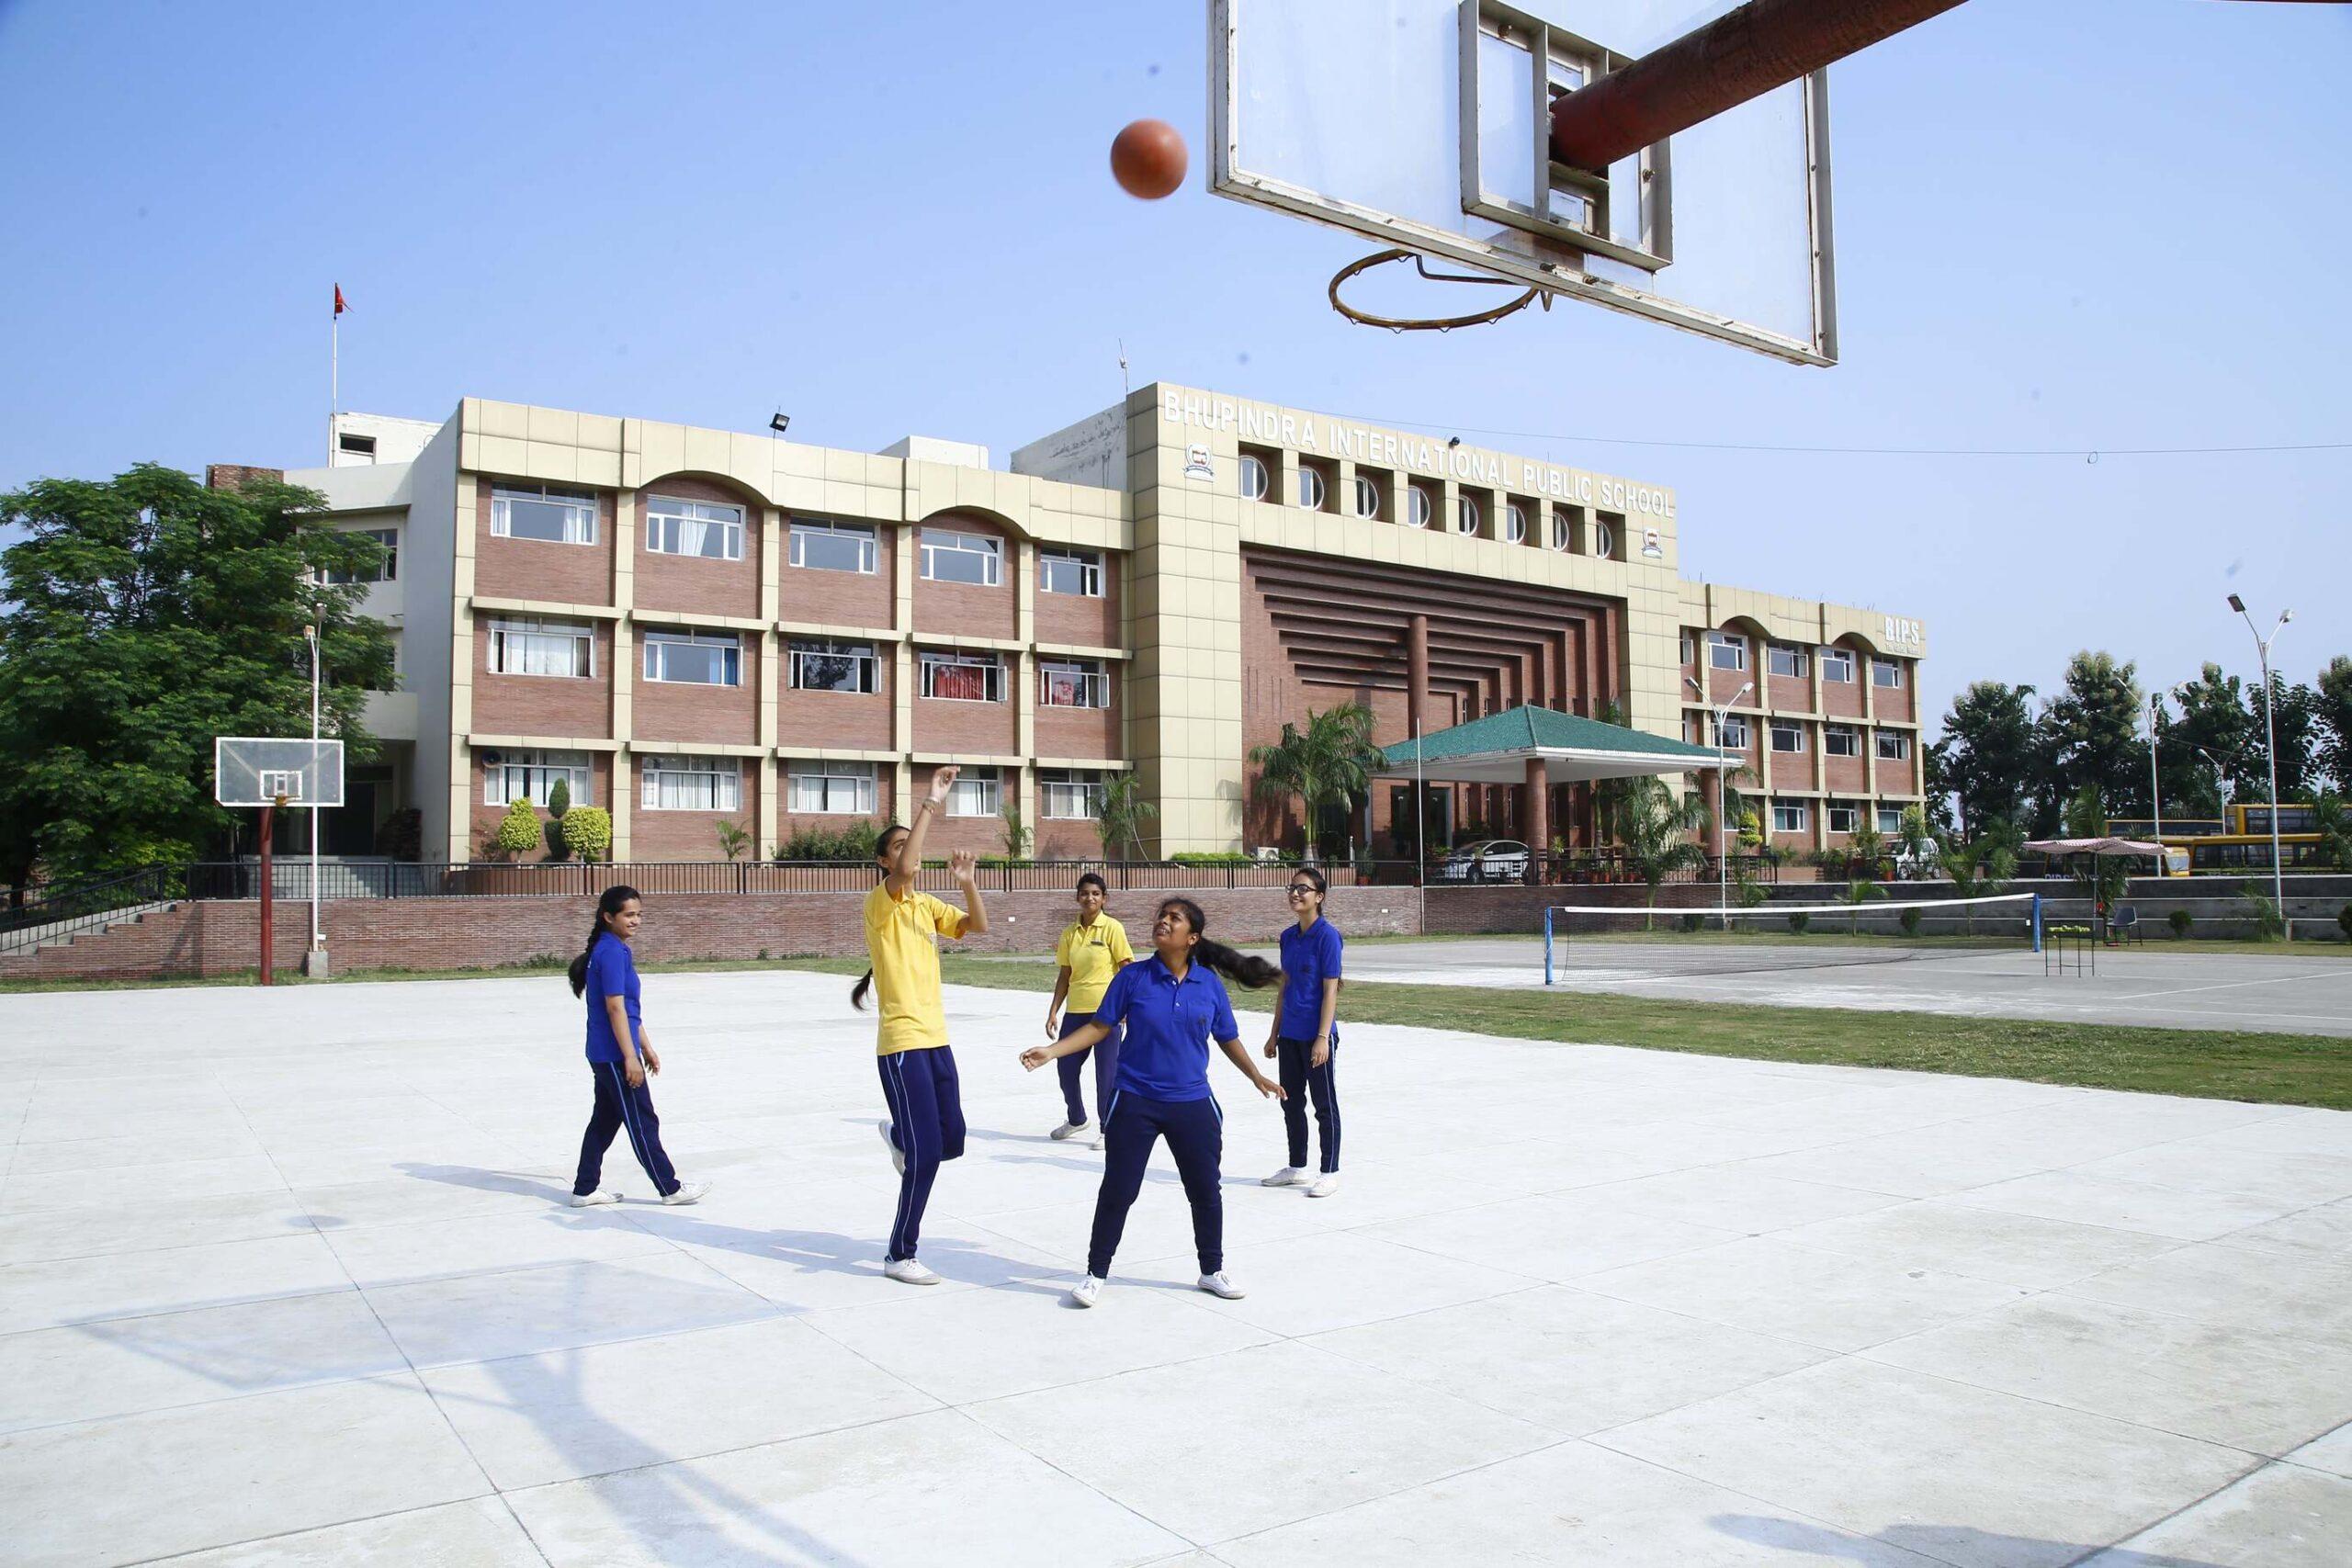 Children's Playing basket ball